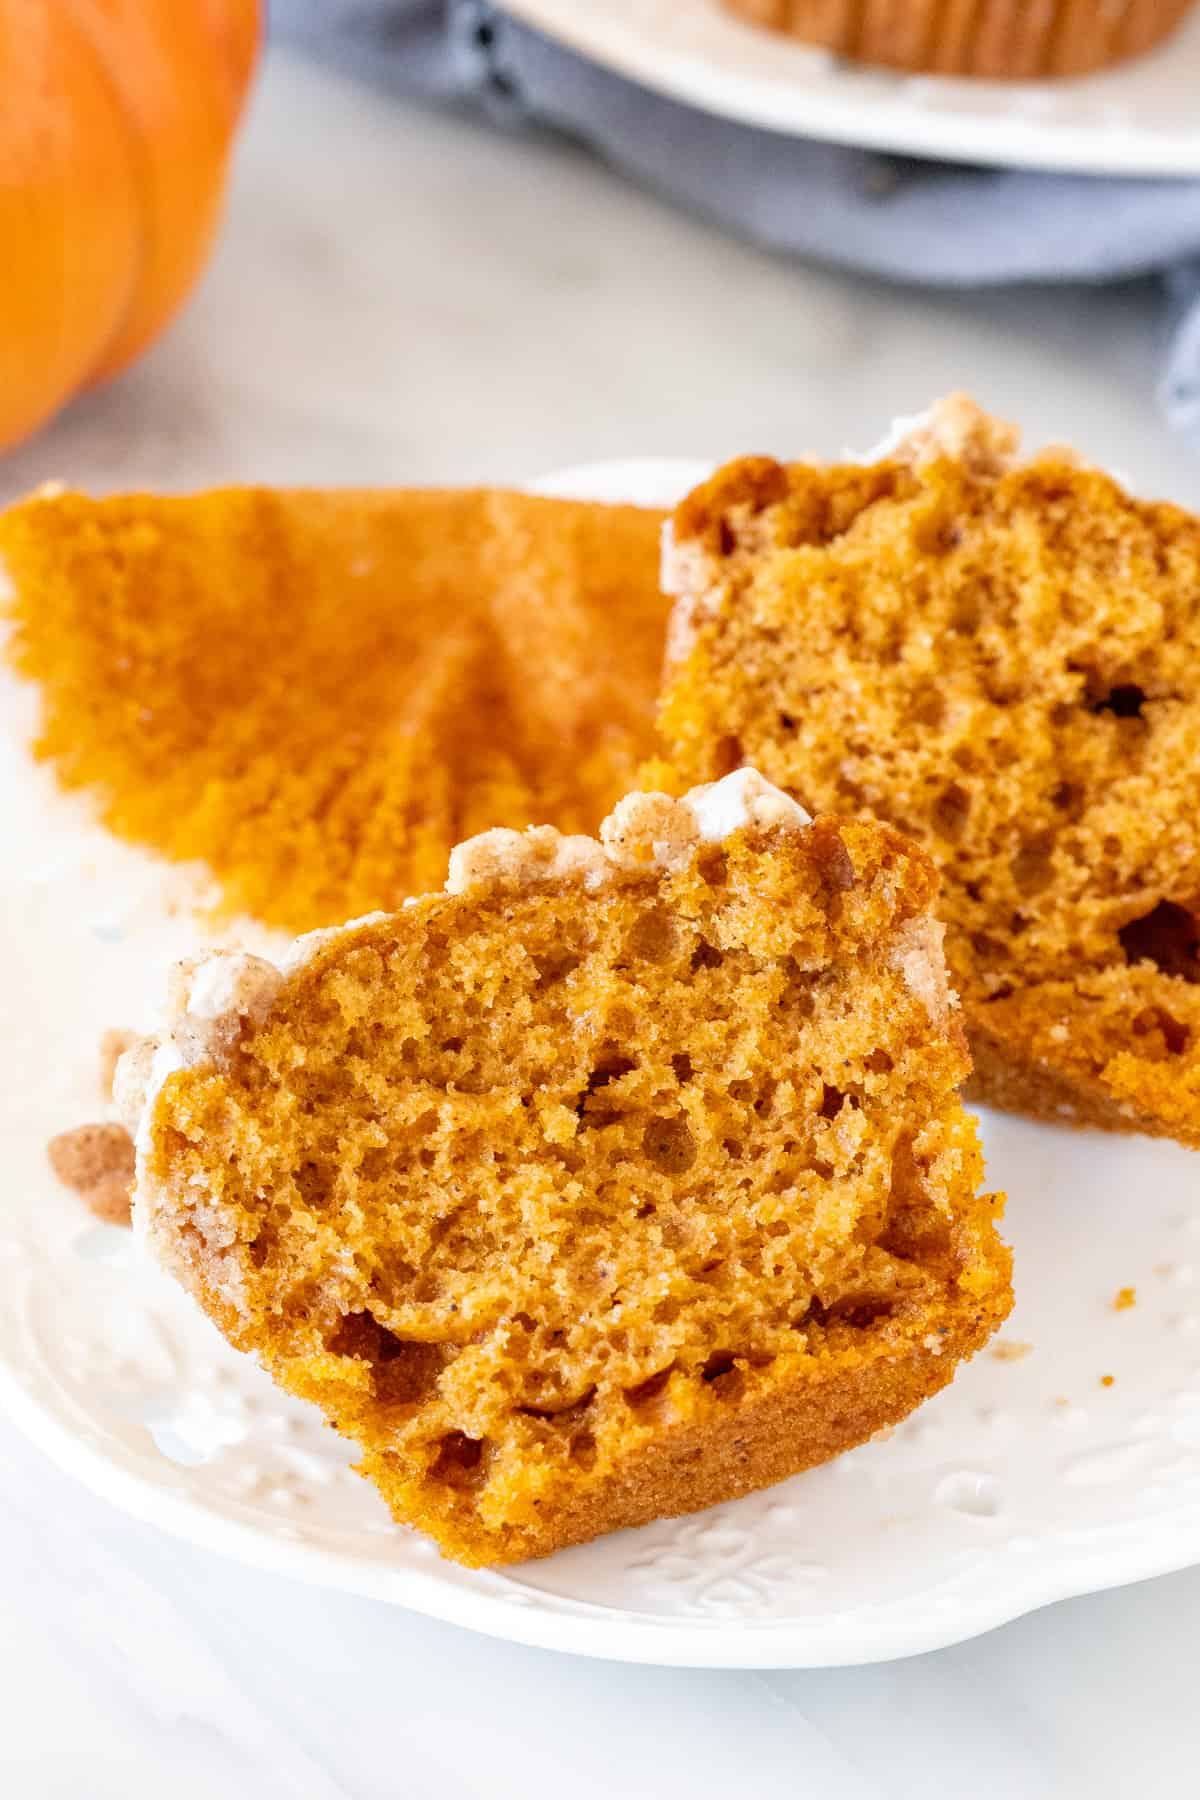 Pumpkin streusel muffin broken in half, on a plate.